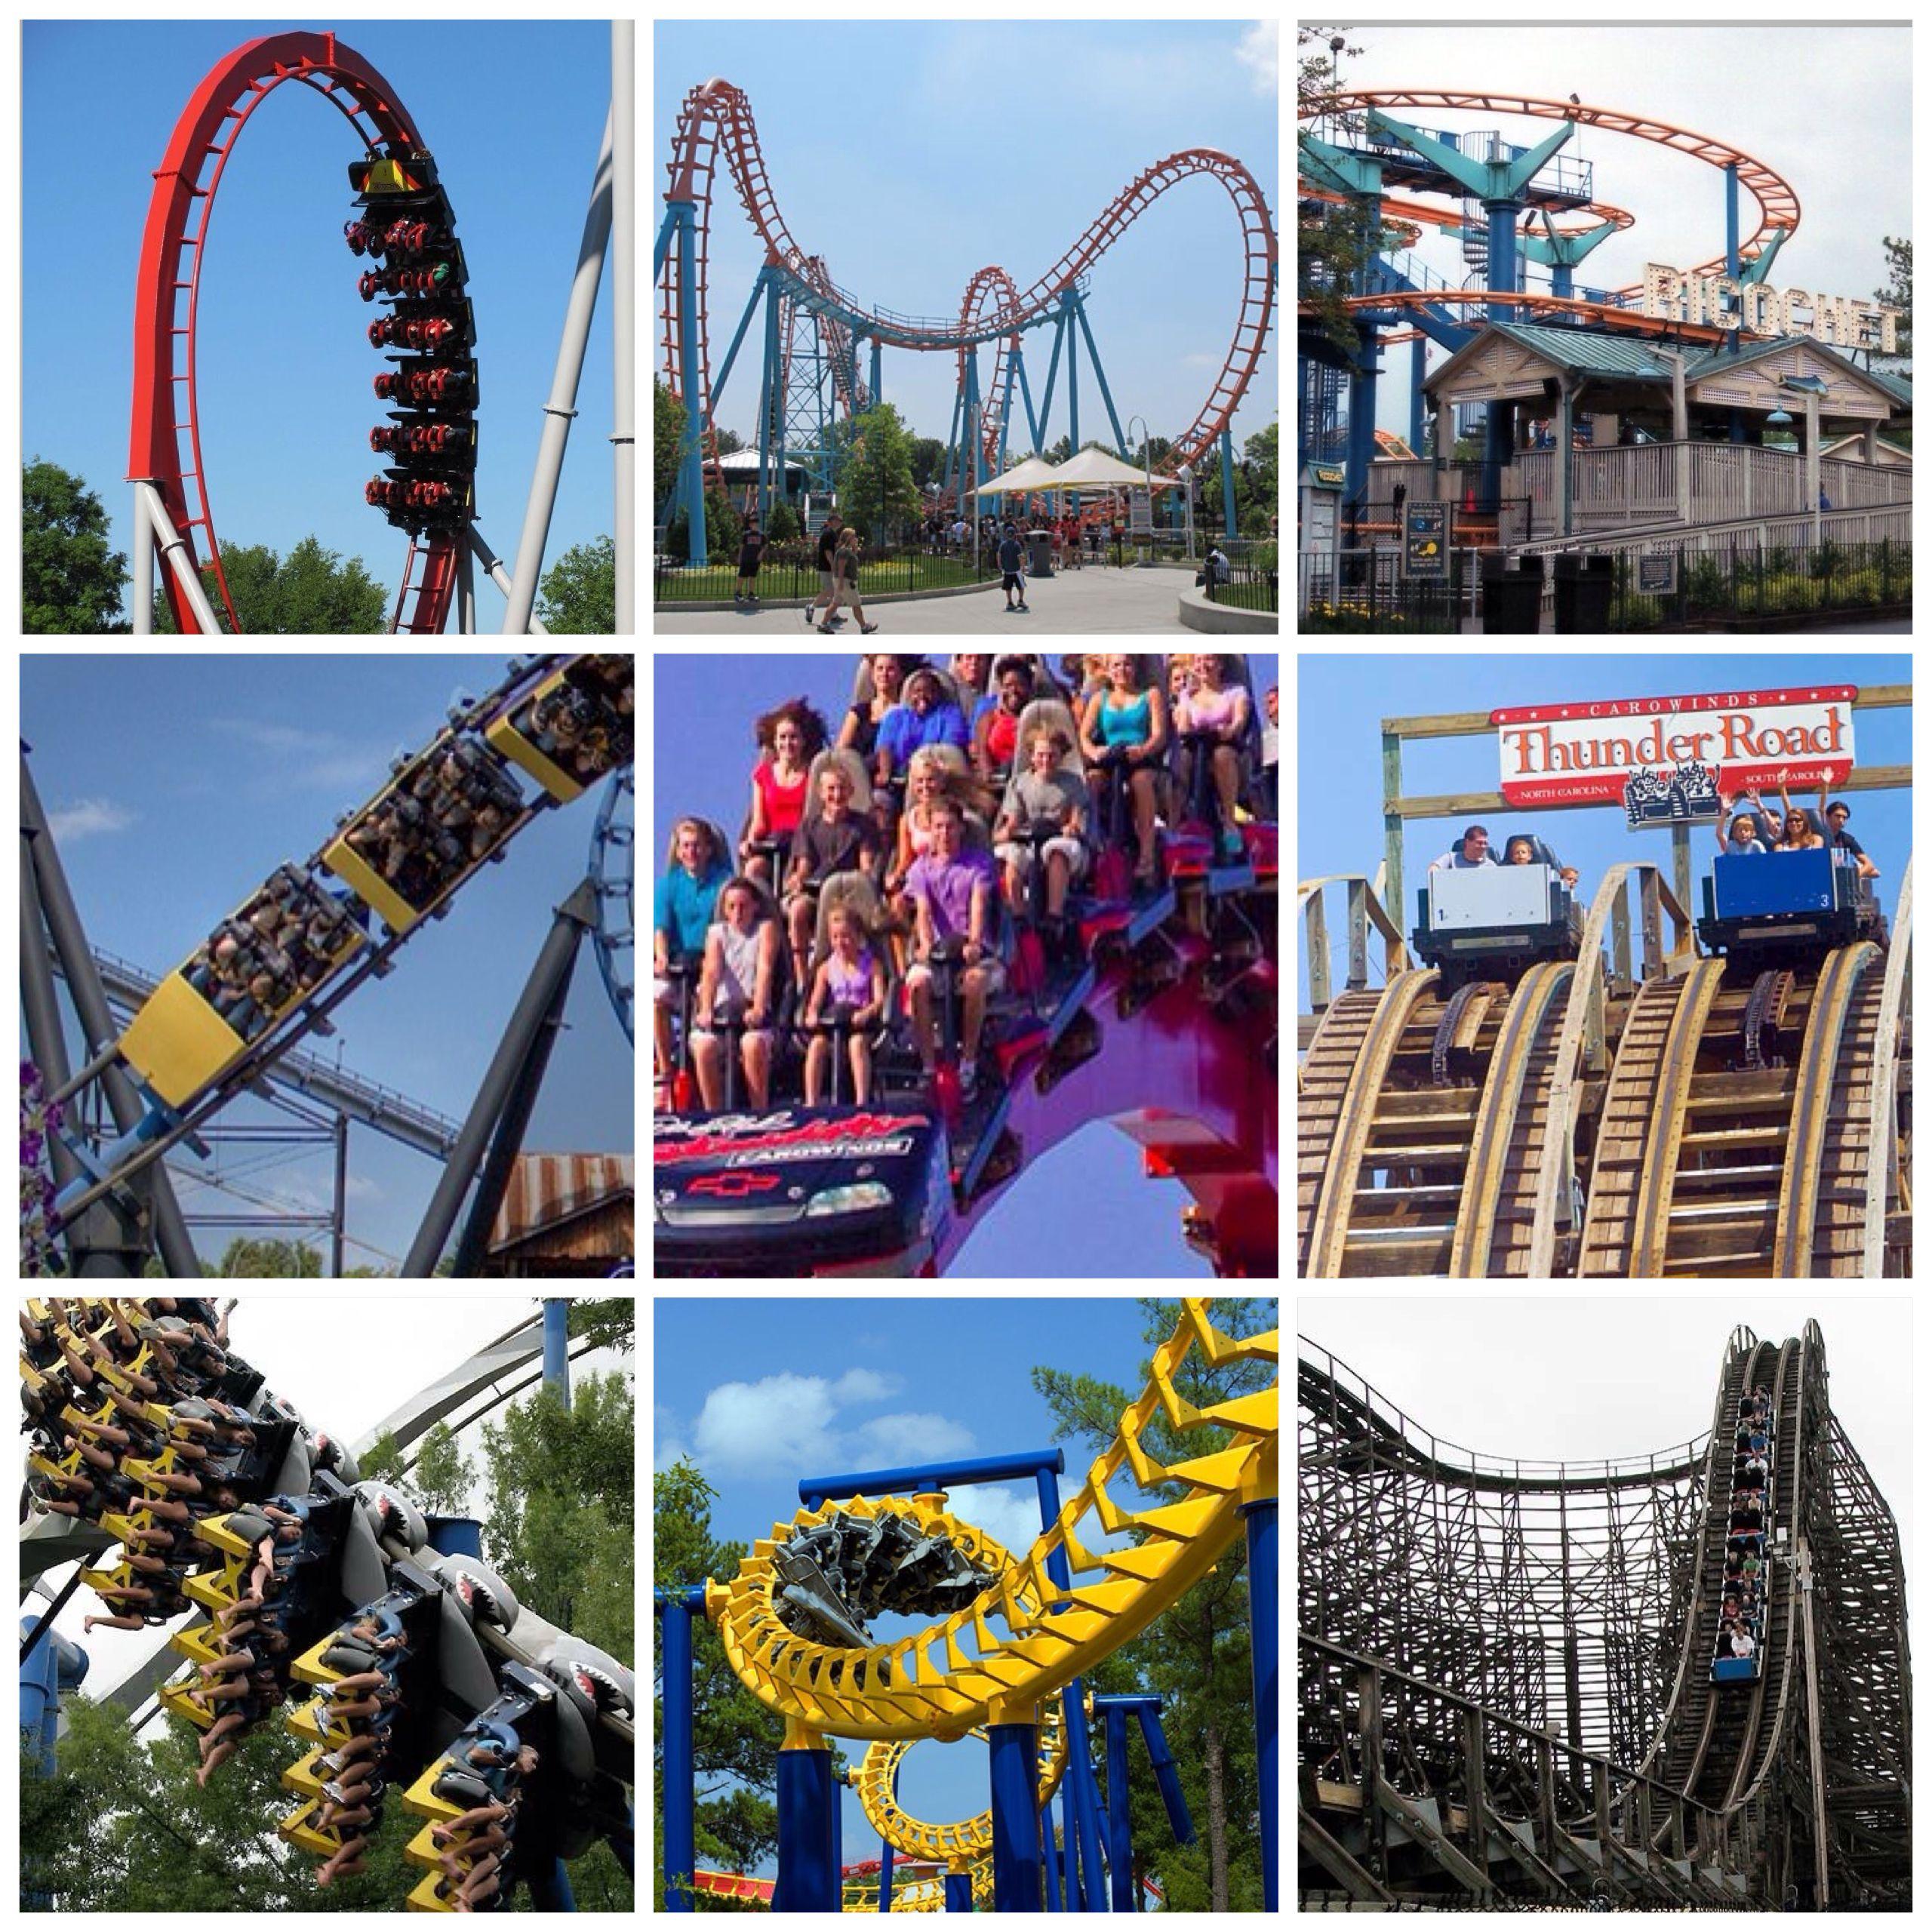 carowinds charlotte nc roller coasters pinterest